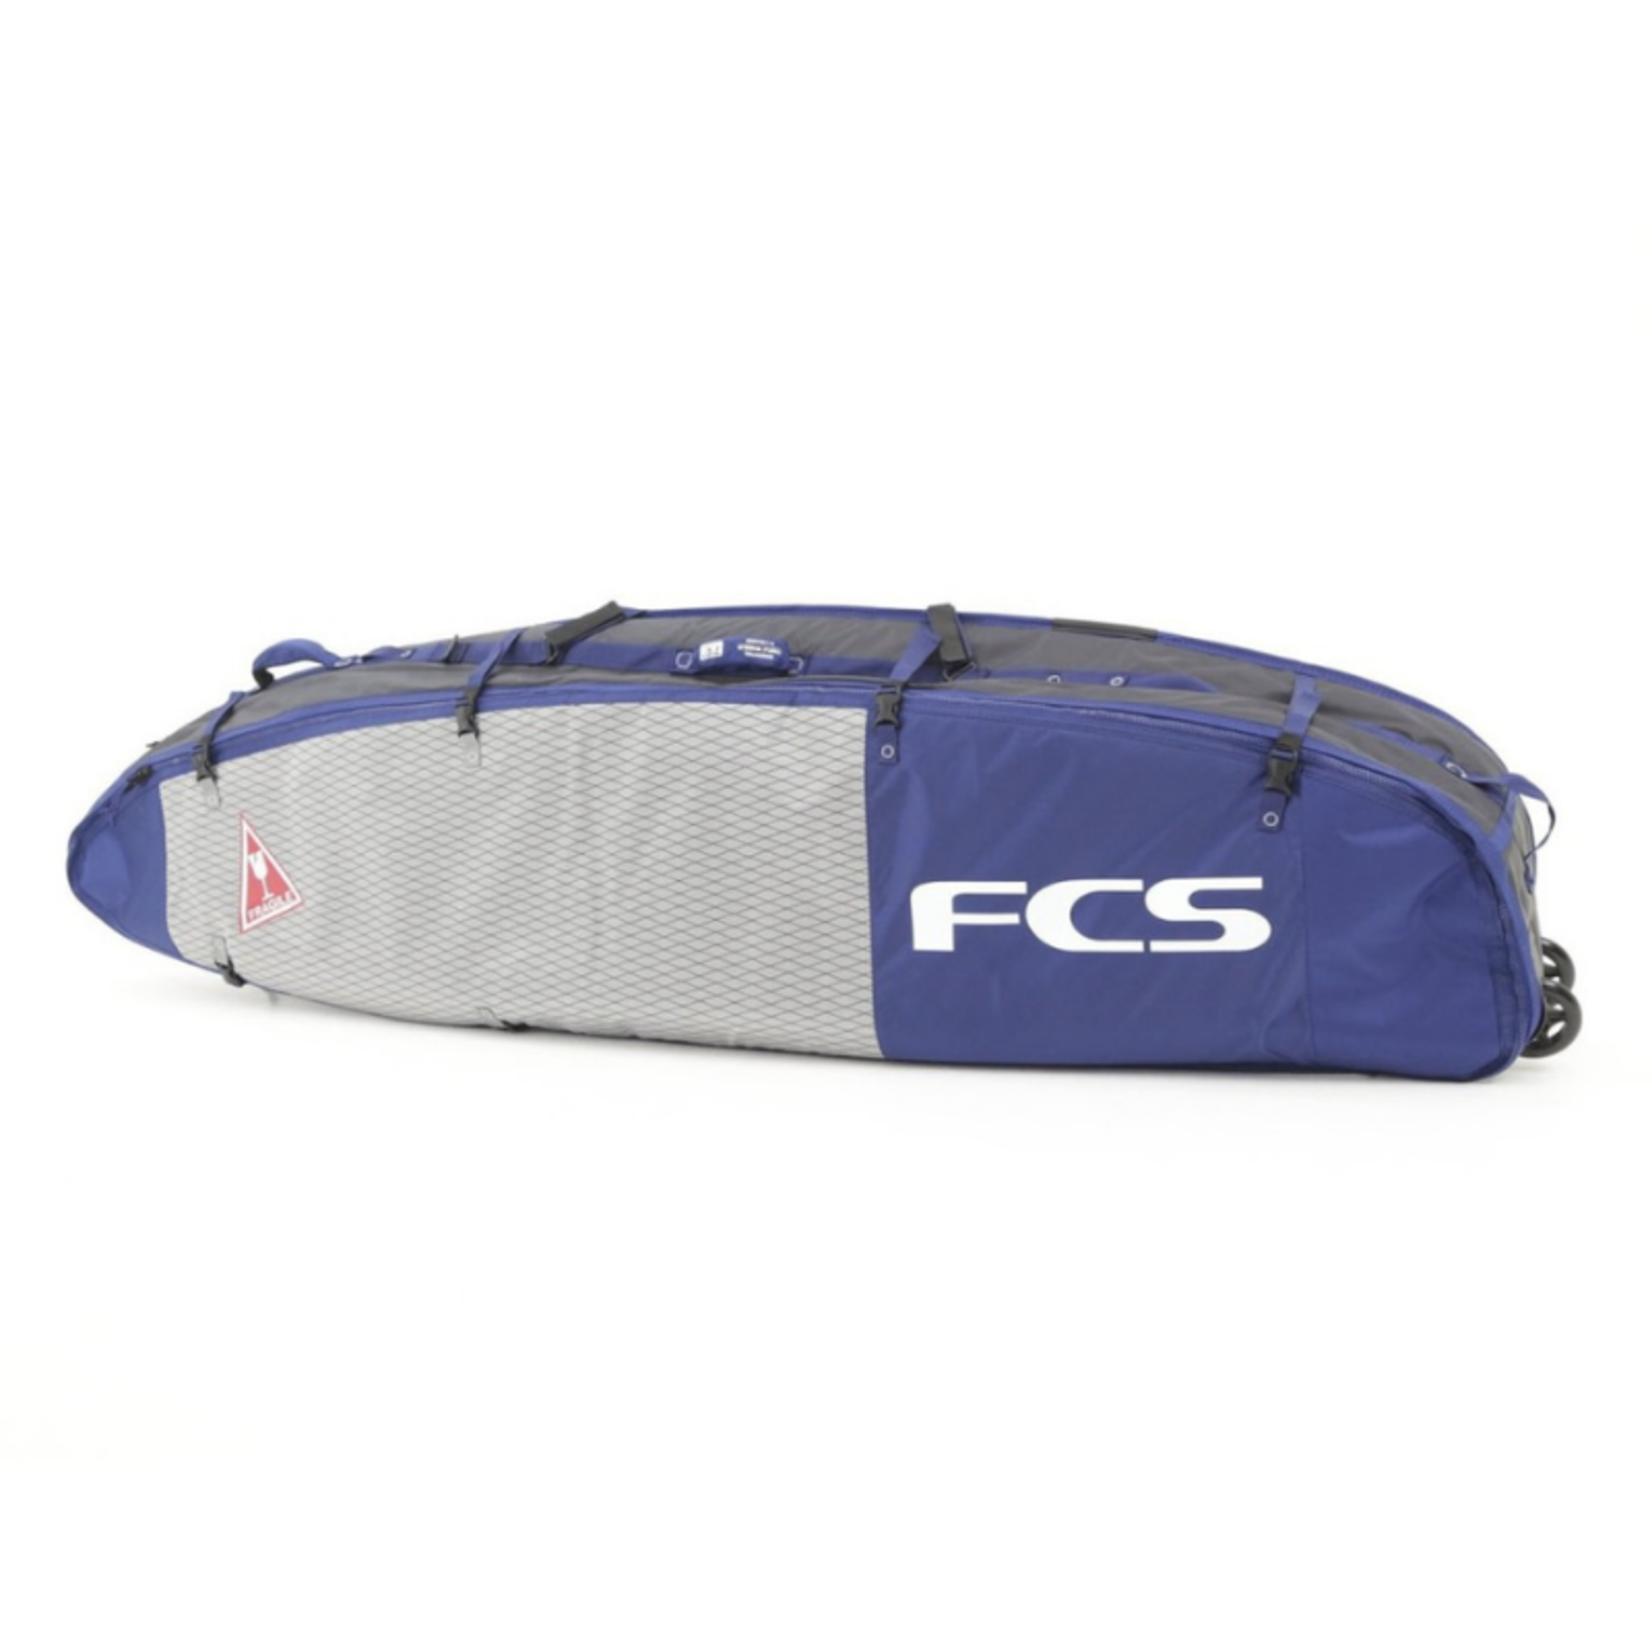 FCS FCS Triple Wheelie All Purpose Travel Cover.